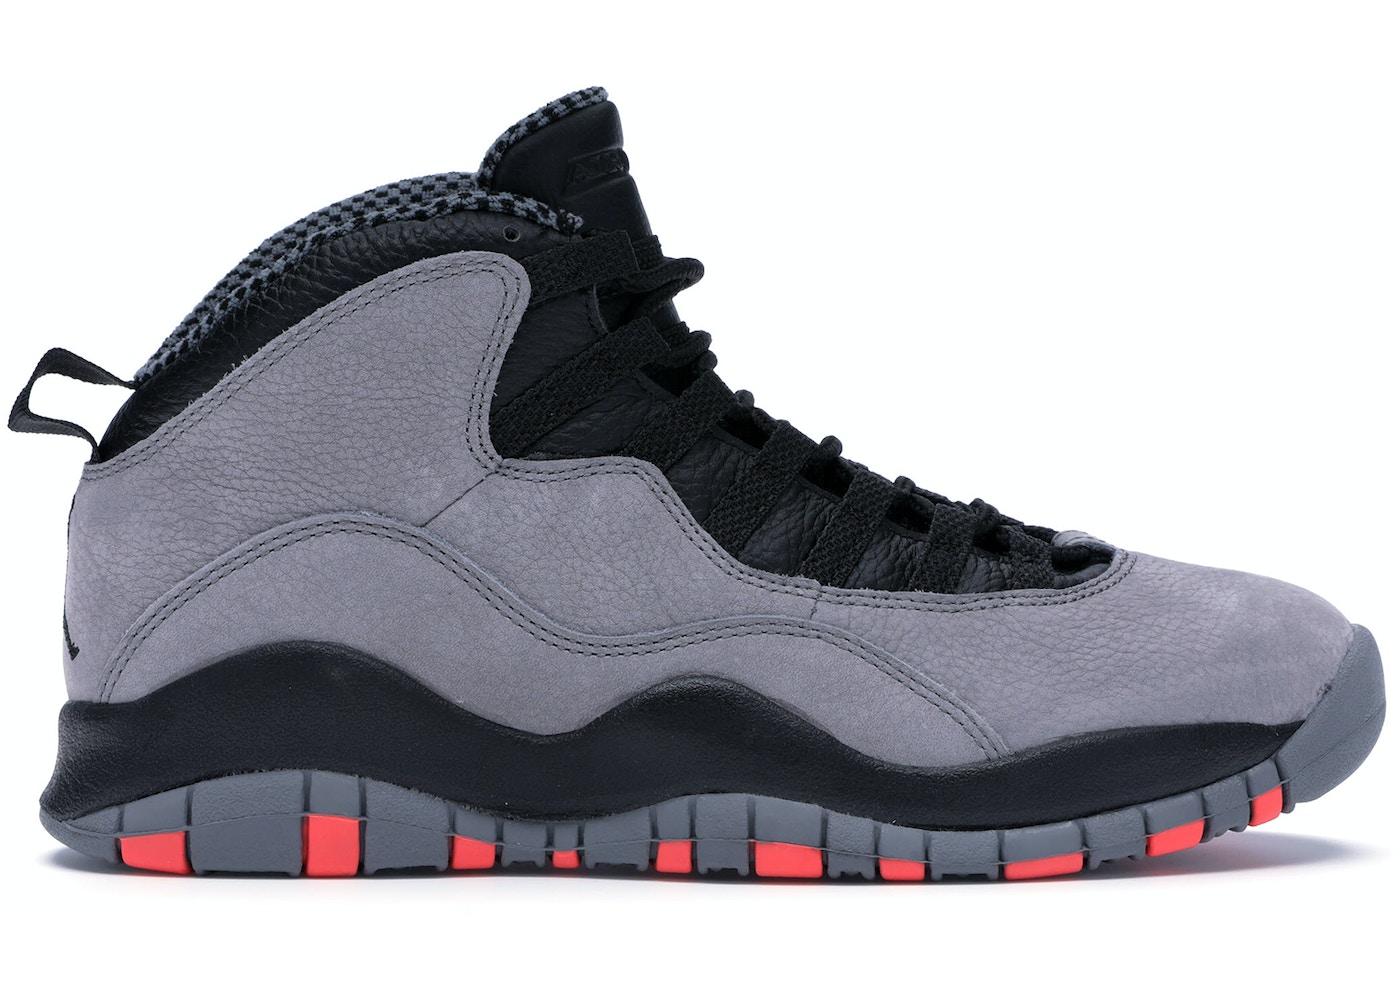 1450cc81b28 Jordan 10 Retro Cool Grey - 310805-023